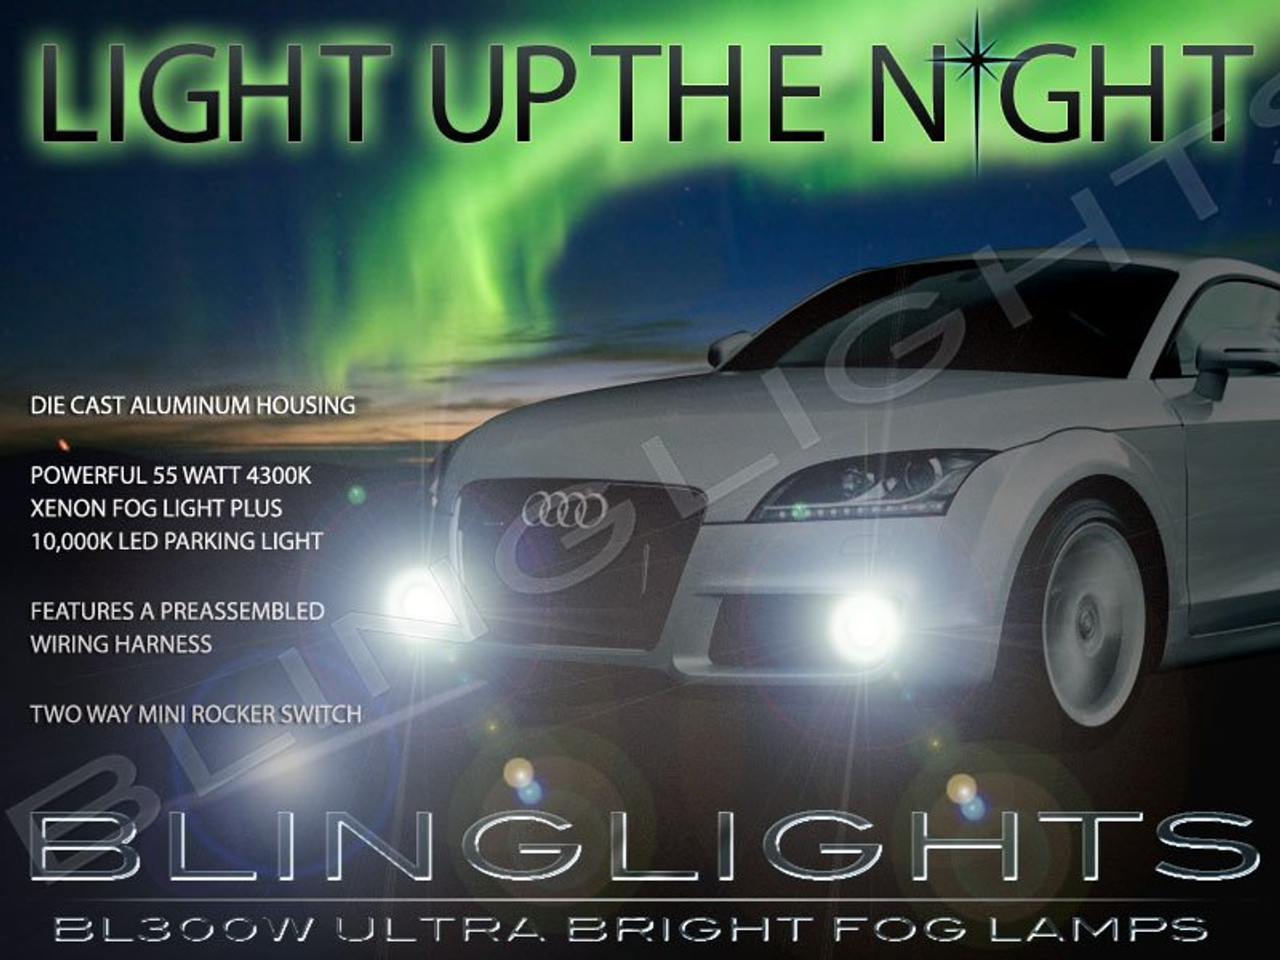 2007 2008 2009 2010 2011 Audi Tt Xenon Fog Lamps Driving Lights Foglamps Foglights Kit